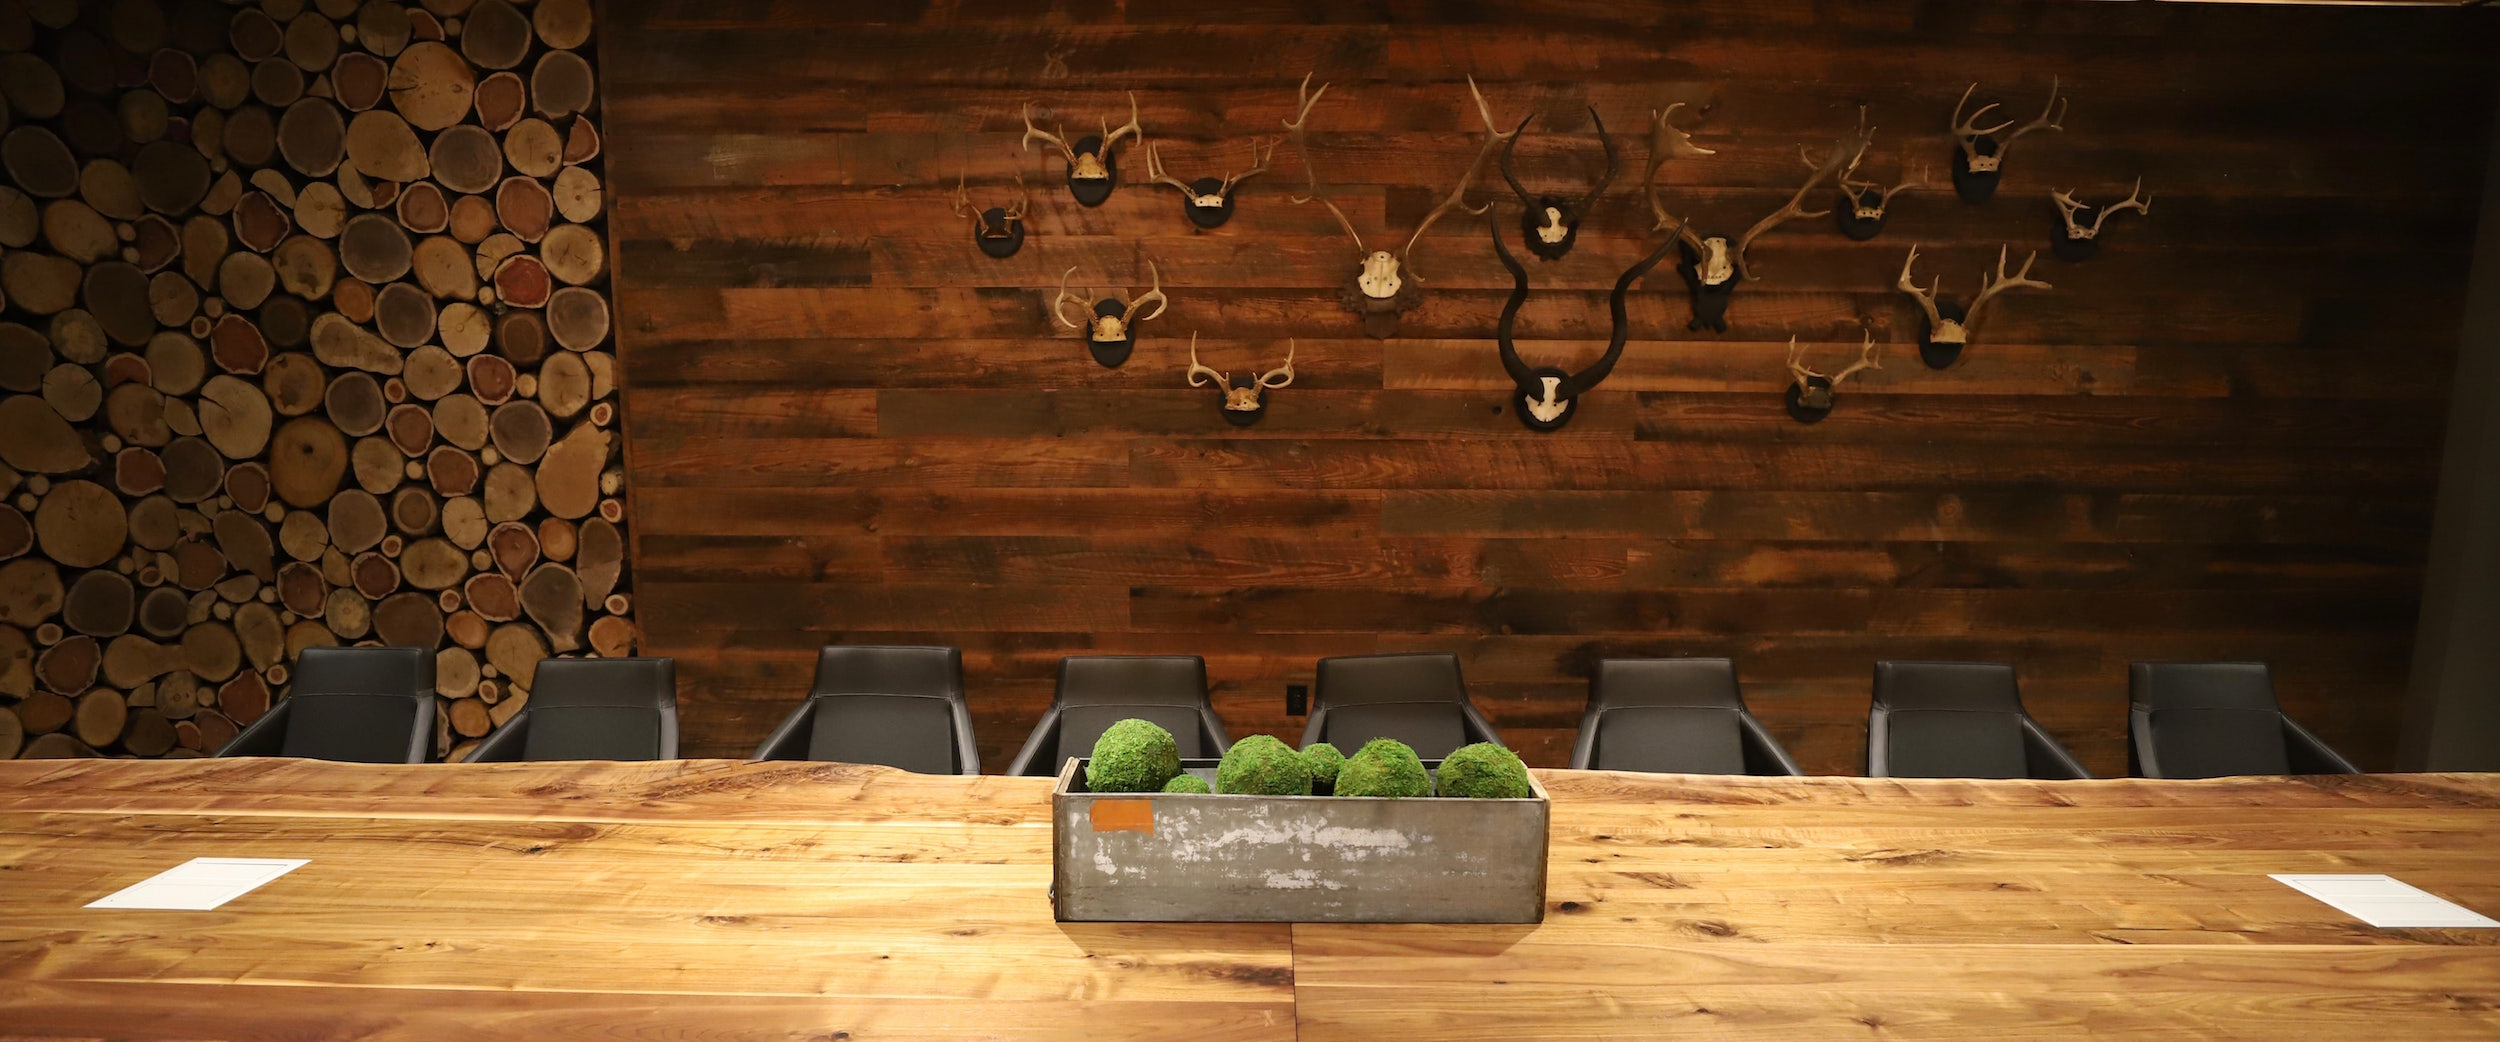 The Retreat luxury board room at Roam Perimeter.